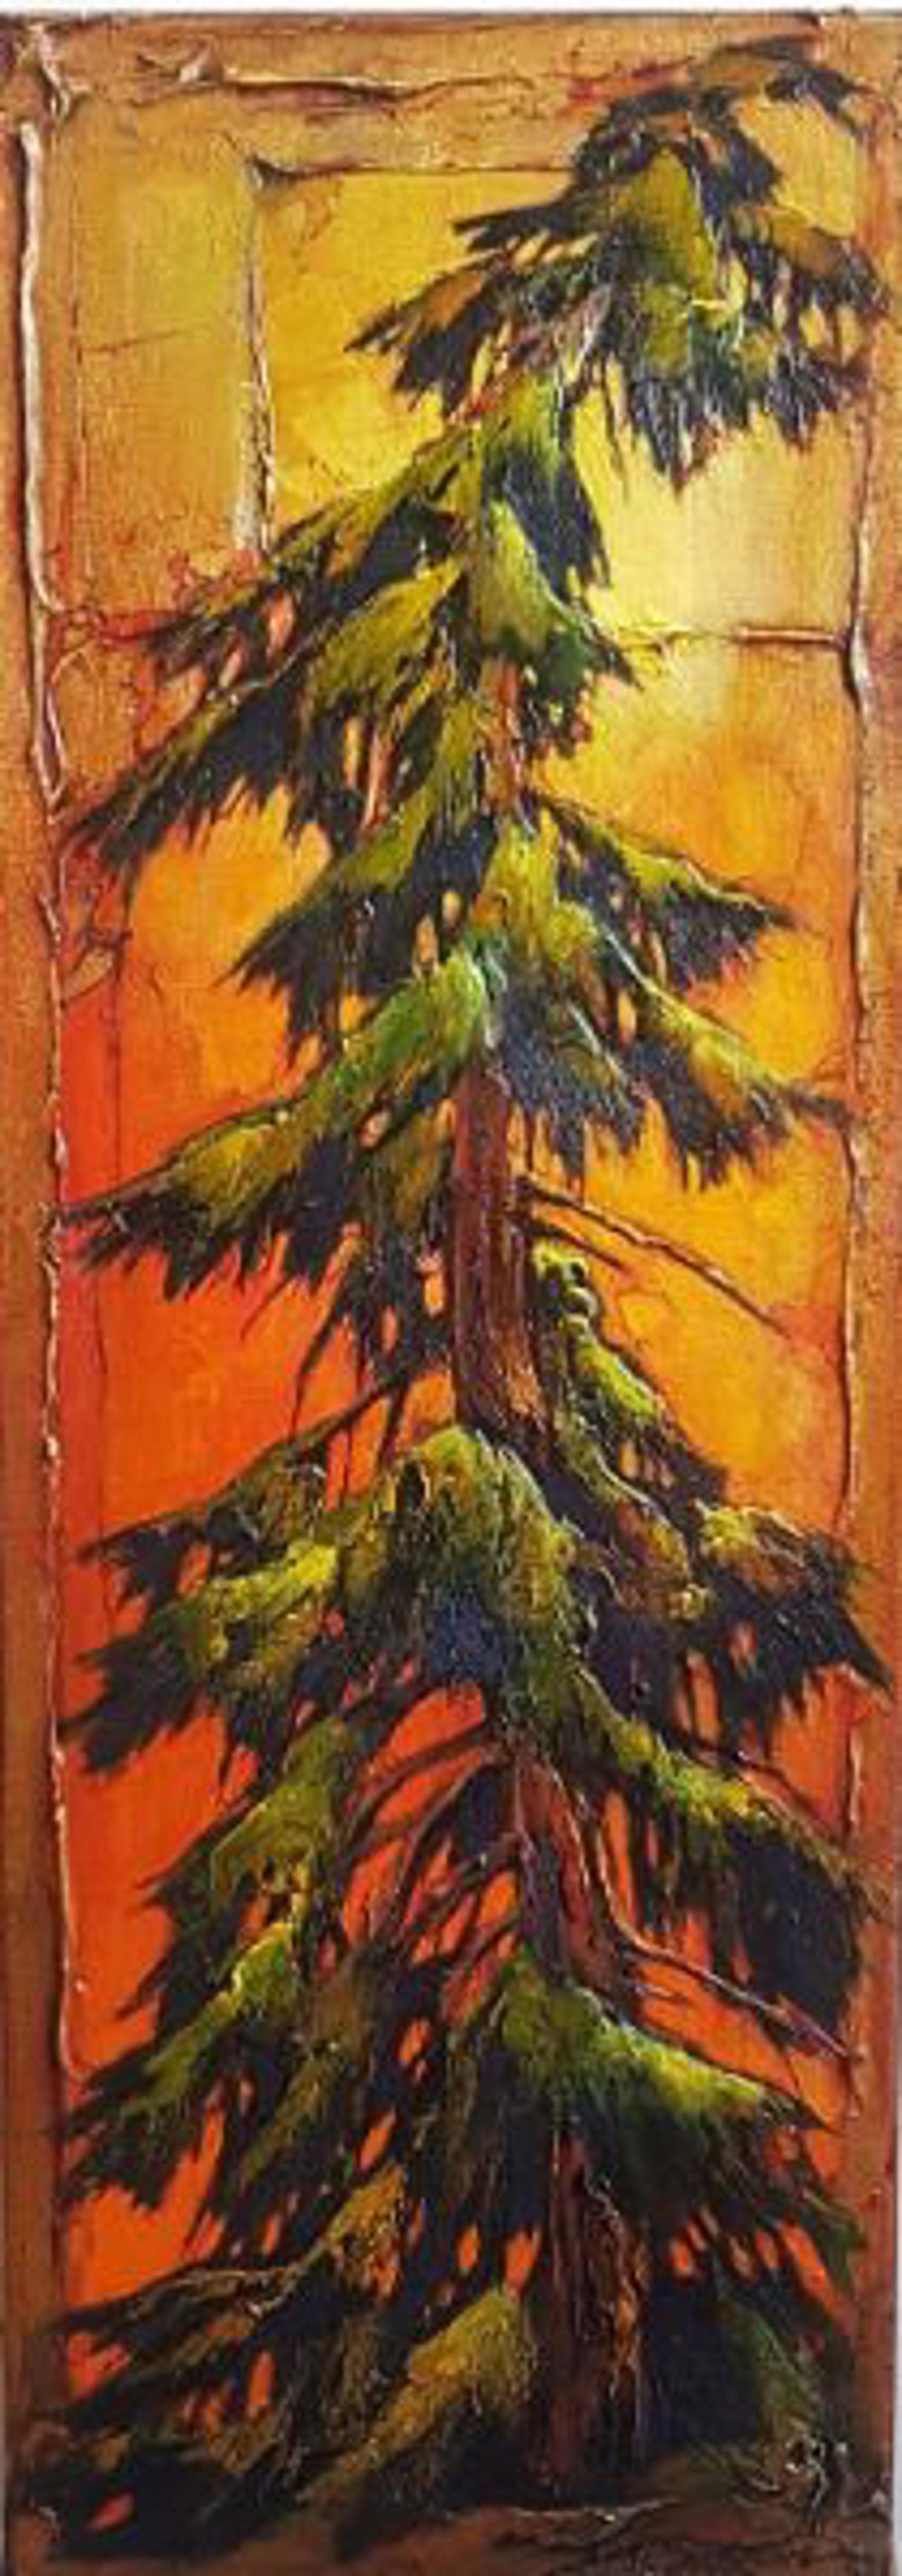 David Langevin - Orange Addict by Historical Art